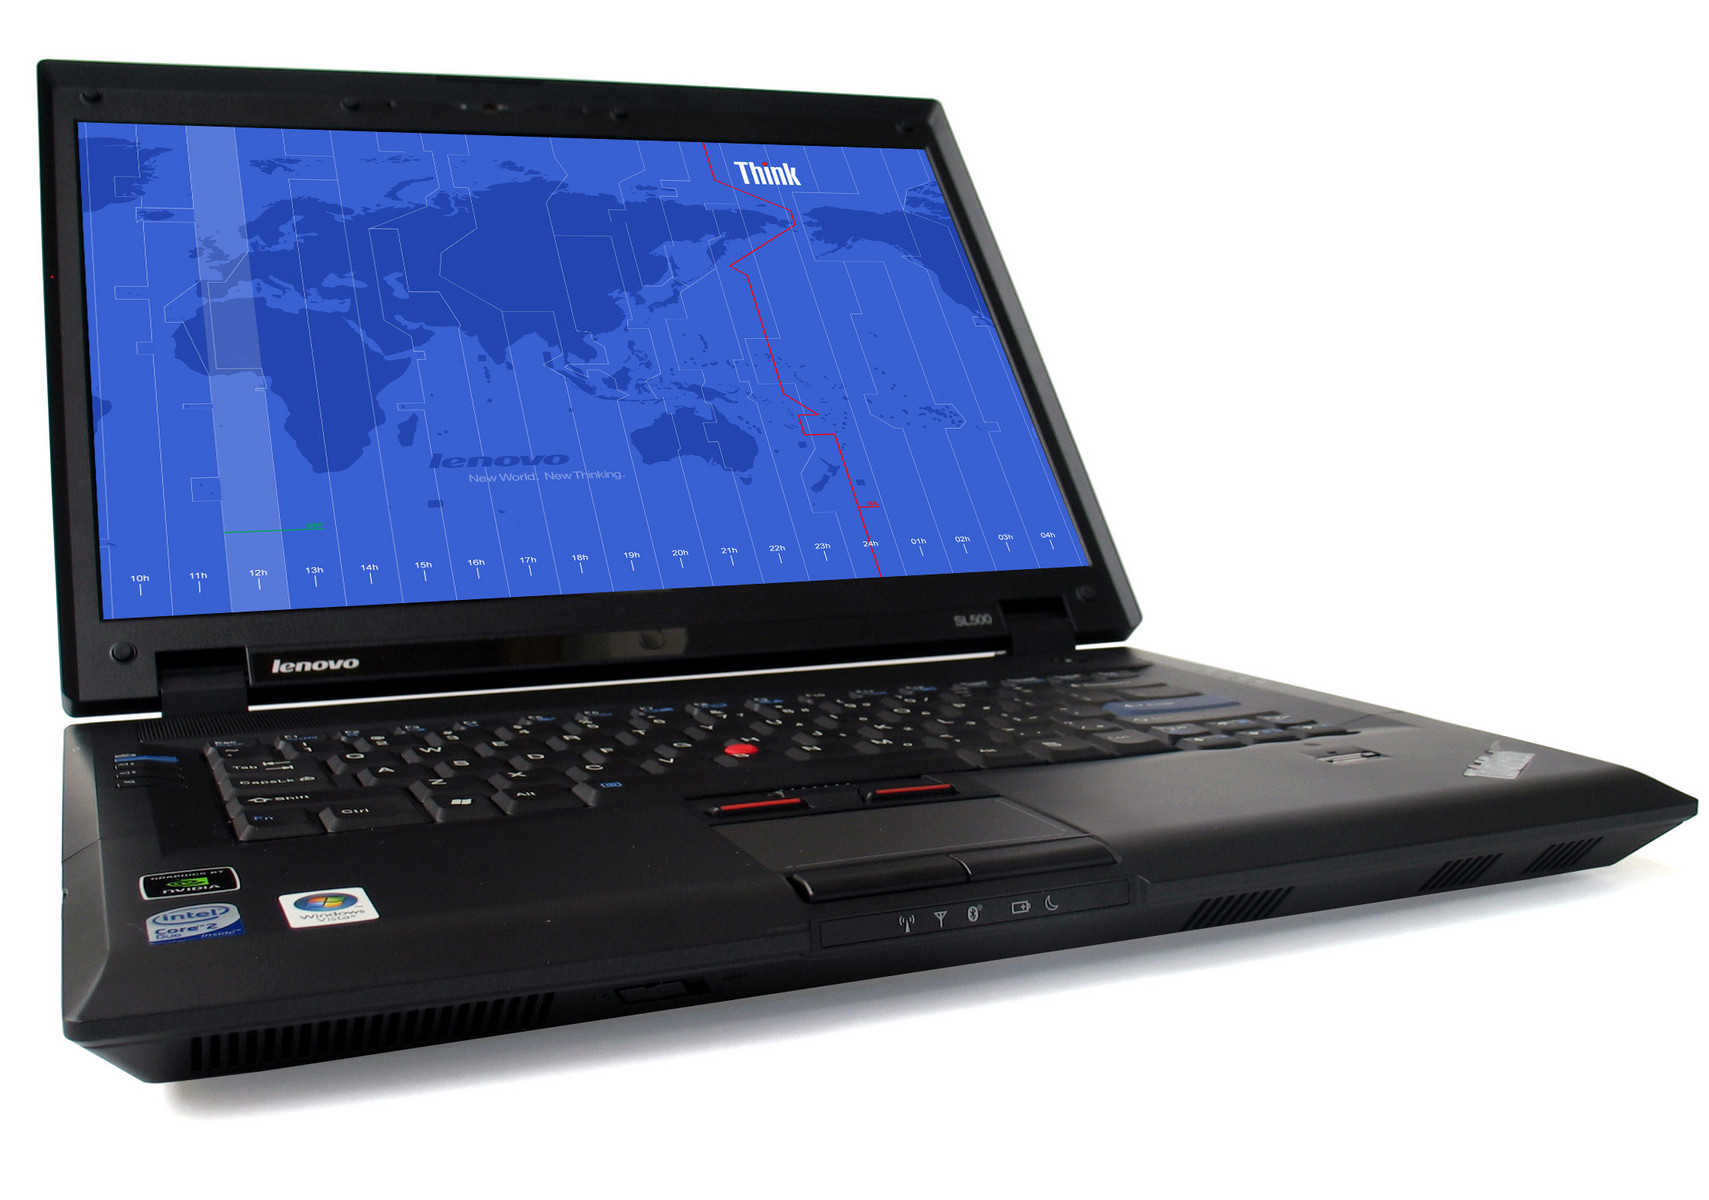 Lenovo Thinkpad Sl500 Notebookcheck Net External Reviews